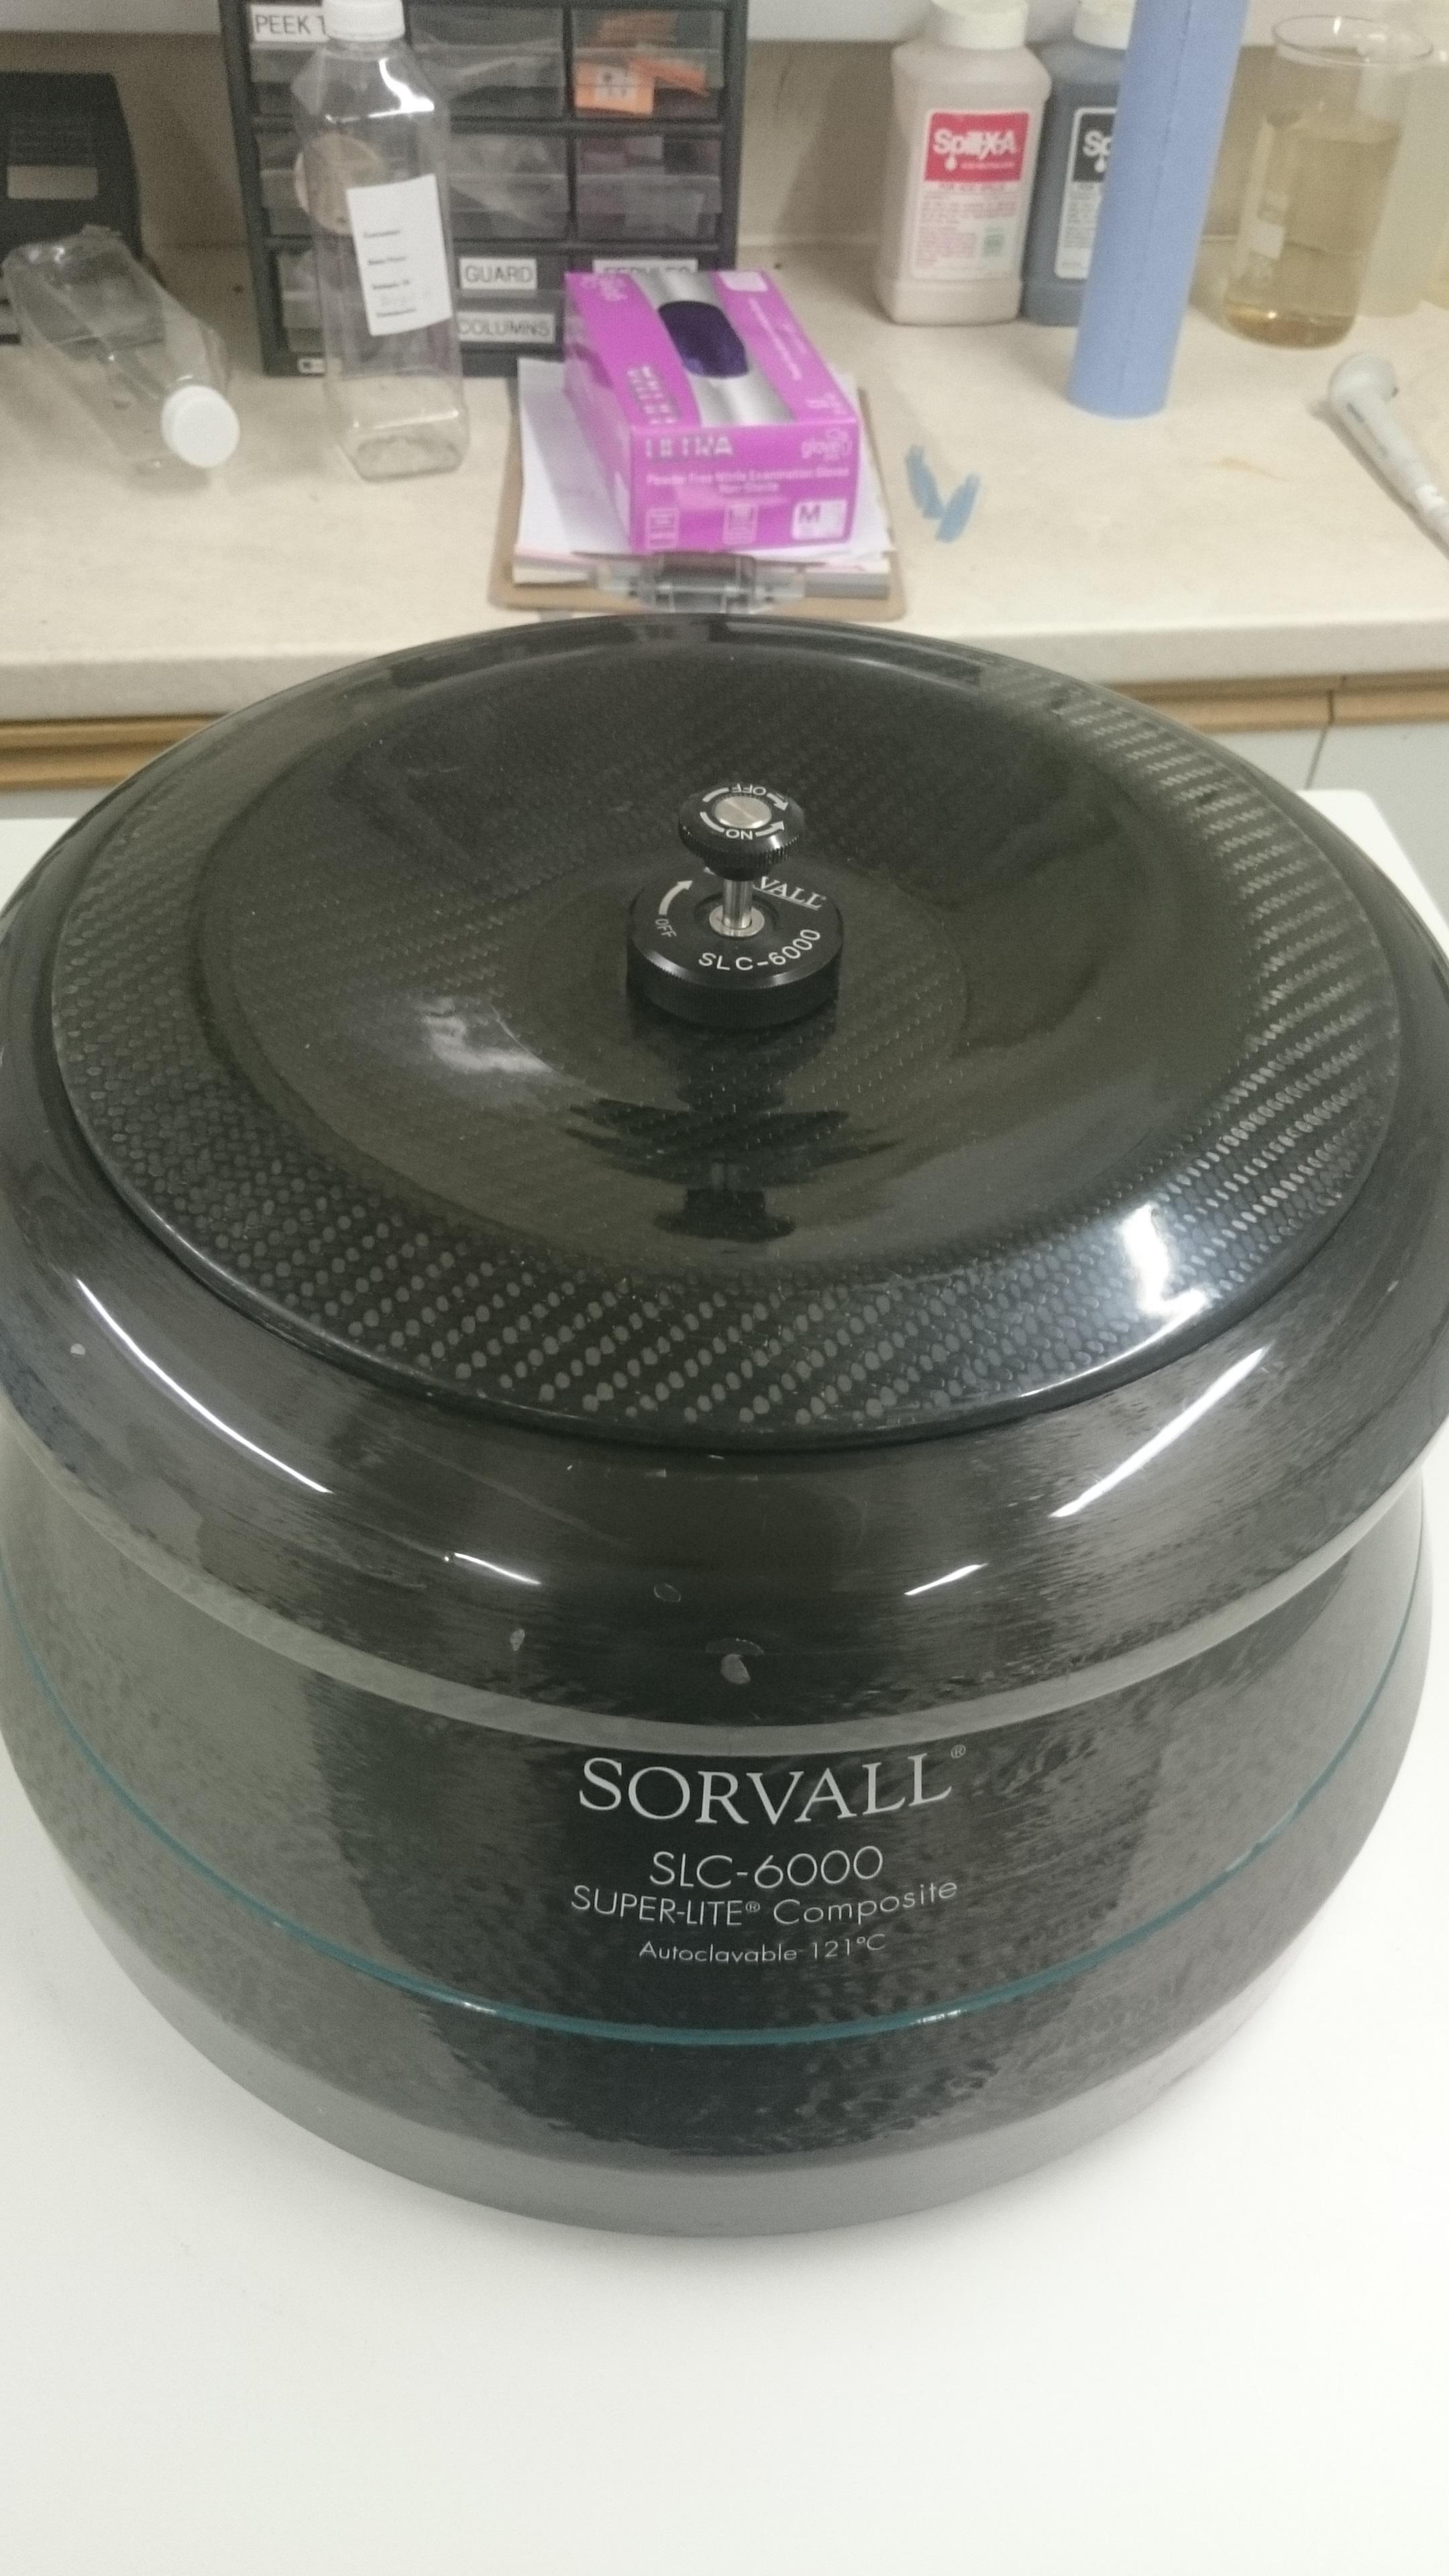 Sorvall SLSorvall 6000 Rotor Carbon Fiber For Sorvall Evolution RC centrifuge 6 x 1L